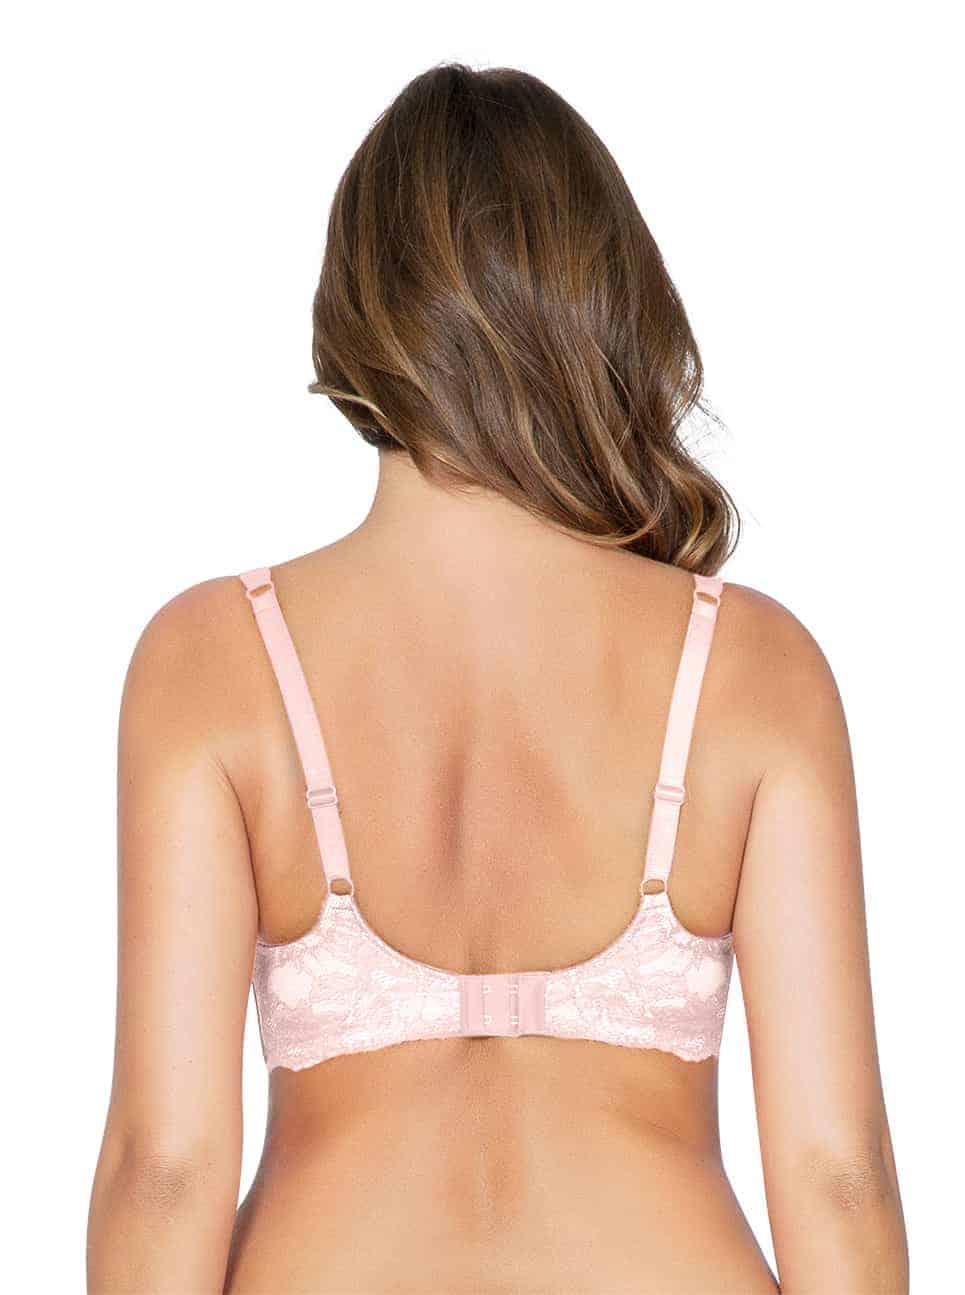 Marion ContourPaddedBraP5391 PinkParfait Back - Marion Contour Padded Bra - Pink Parfait – P5391